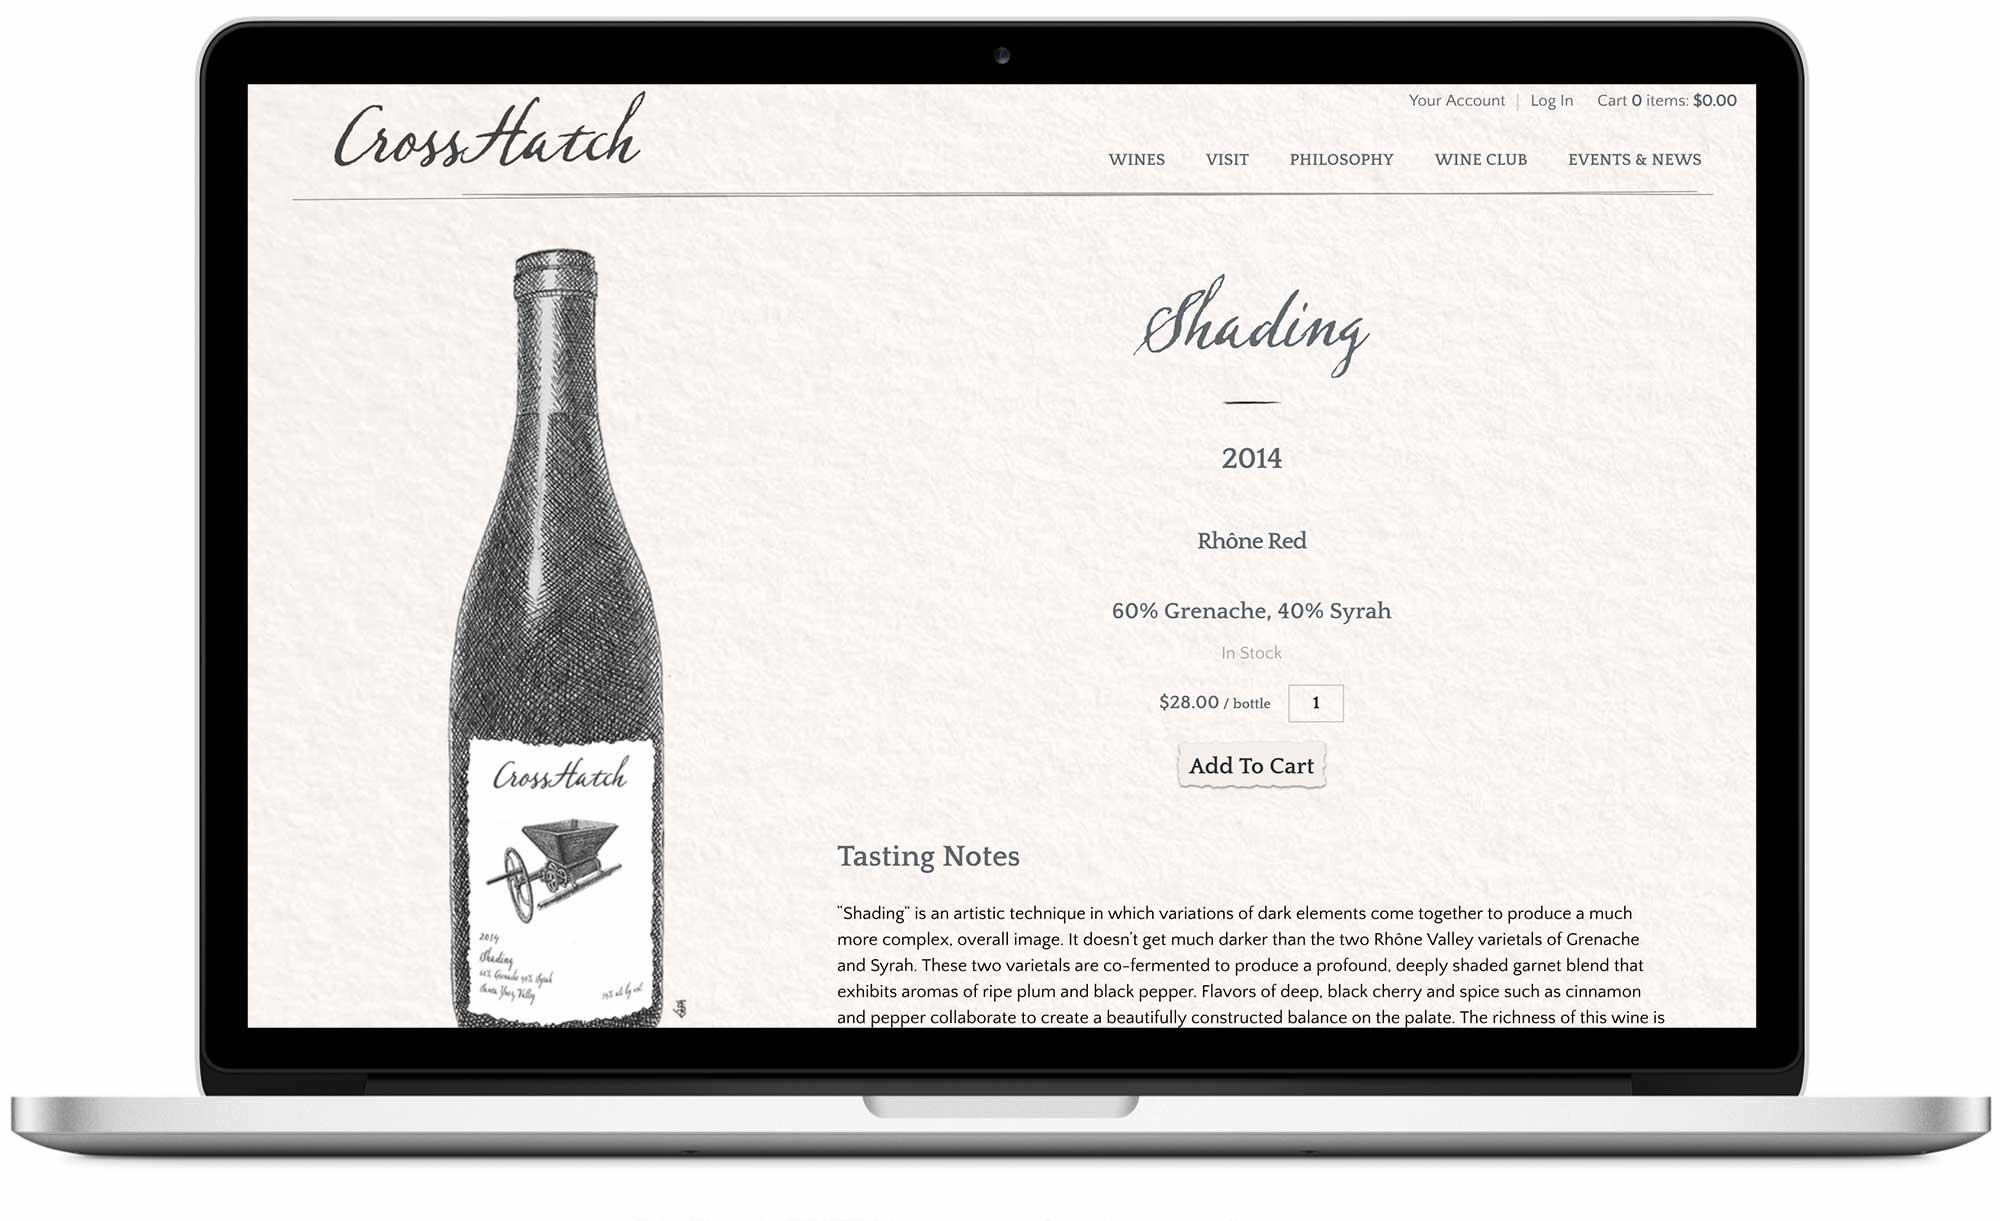 CrossHatch Winery